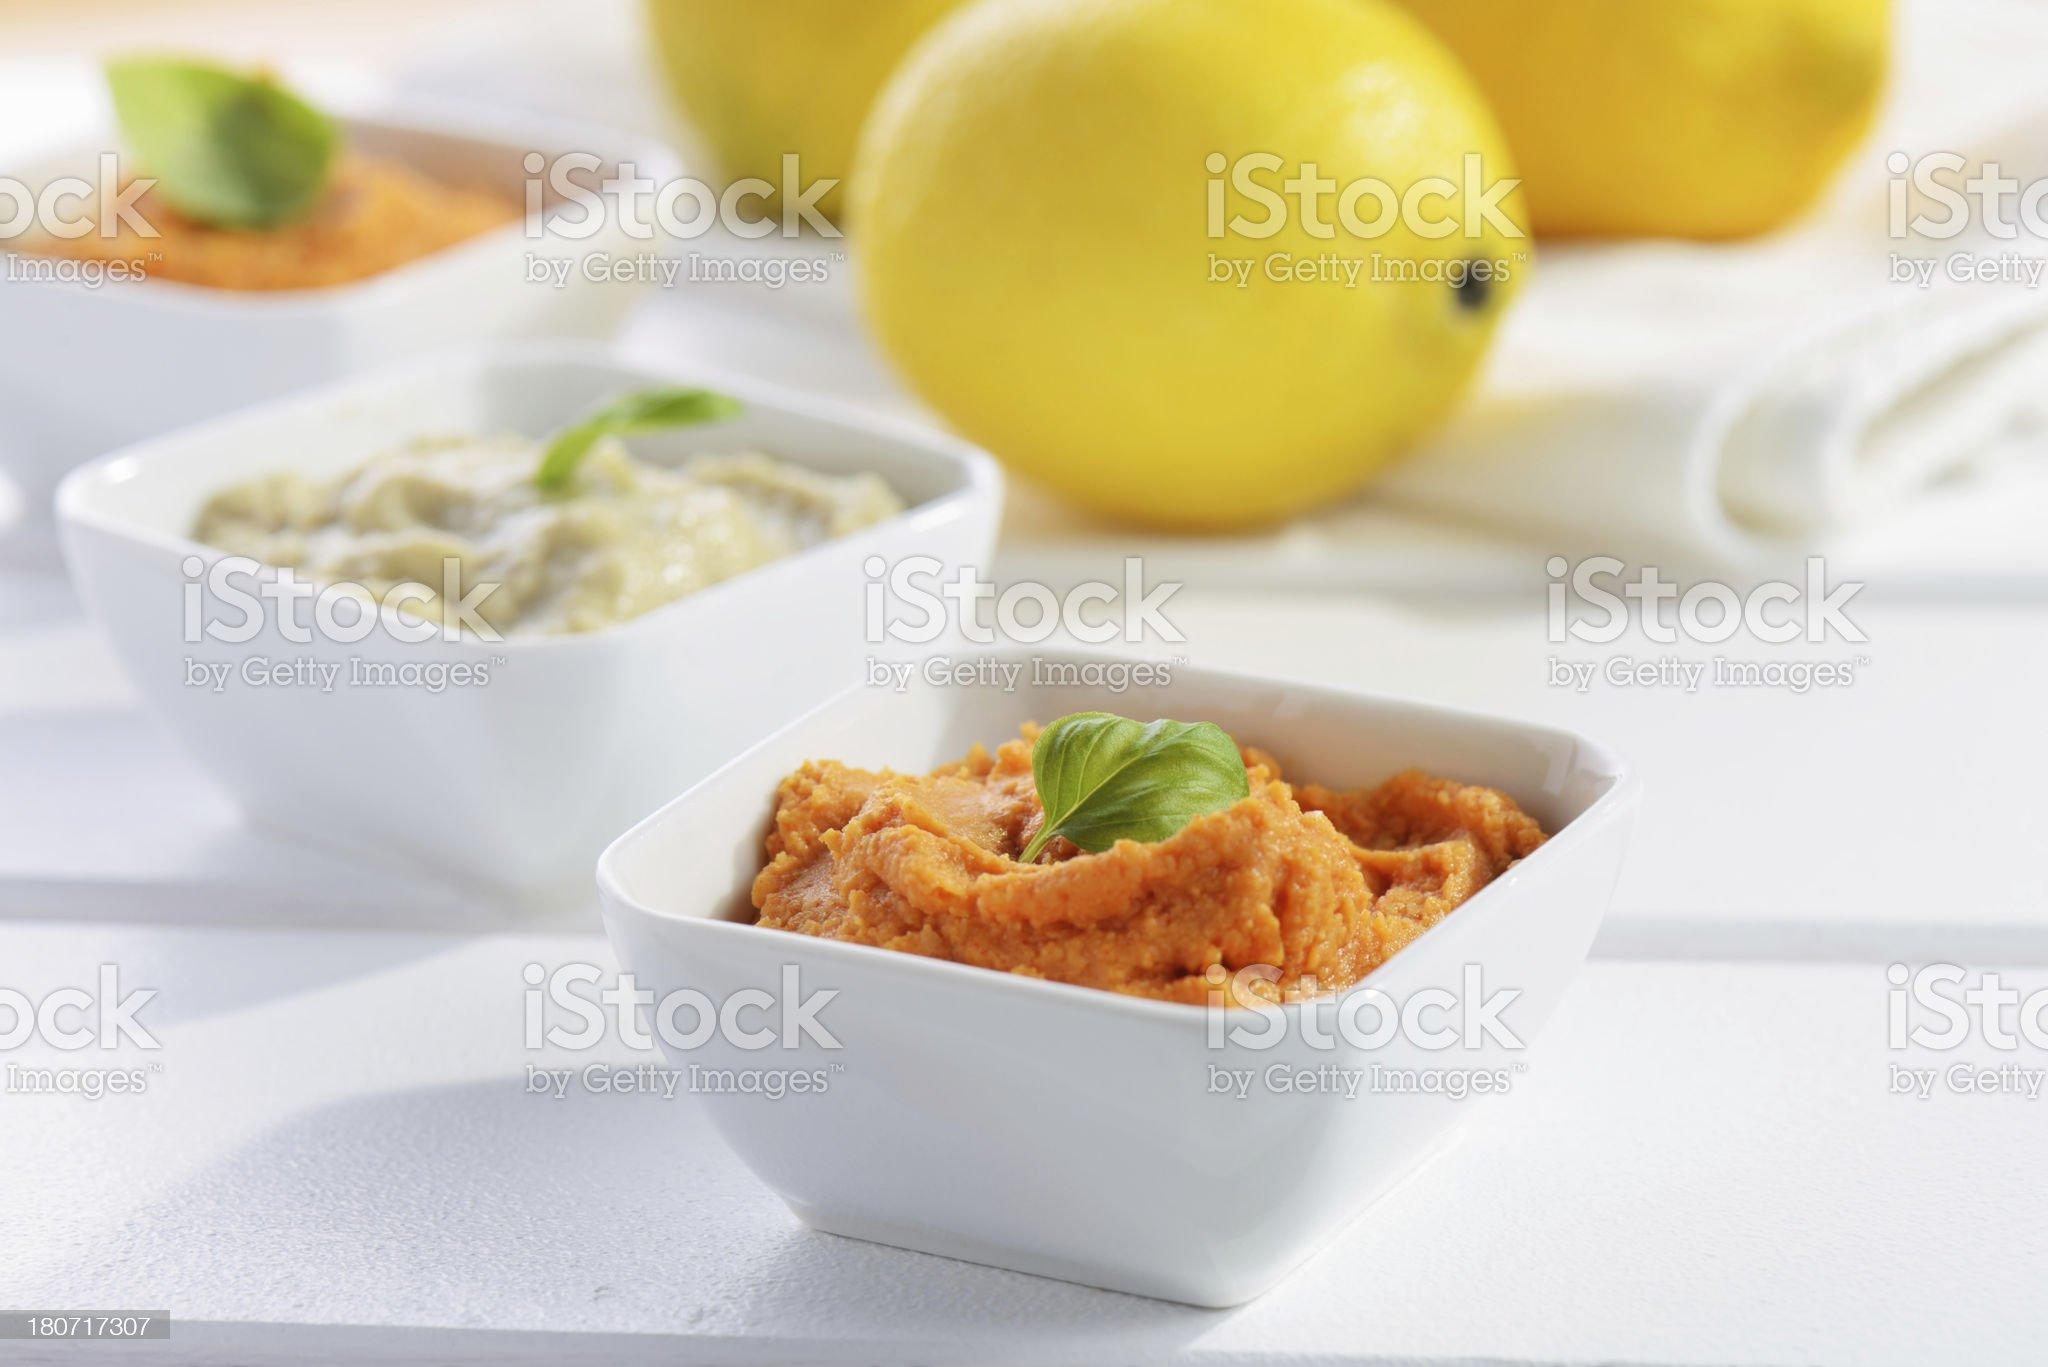 Hummus, Baba Ghanoush royalty-free stock photo